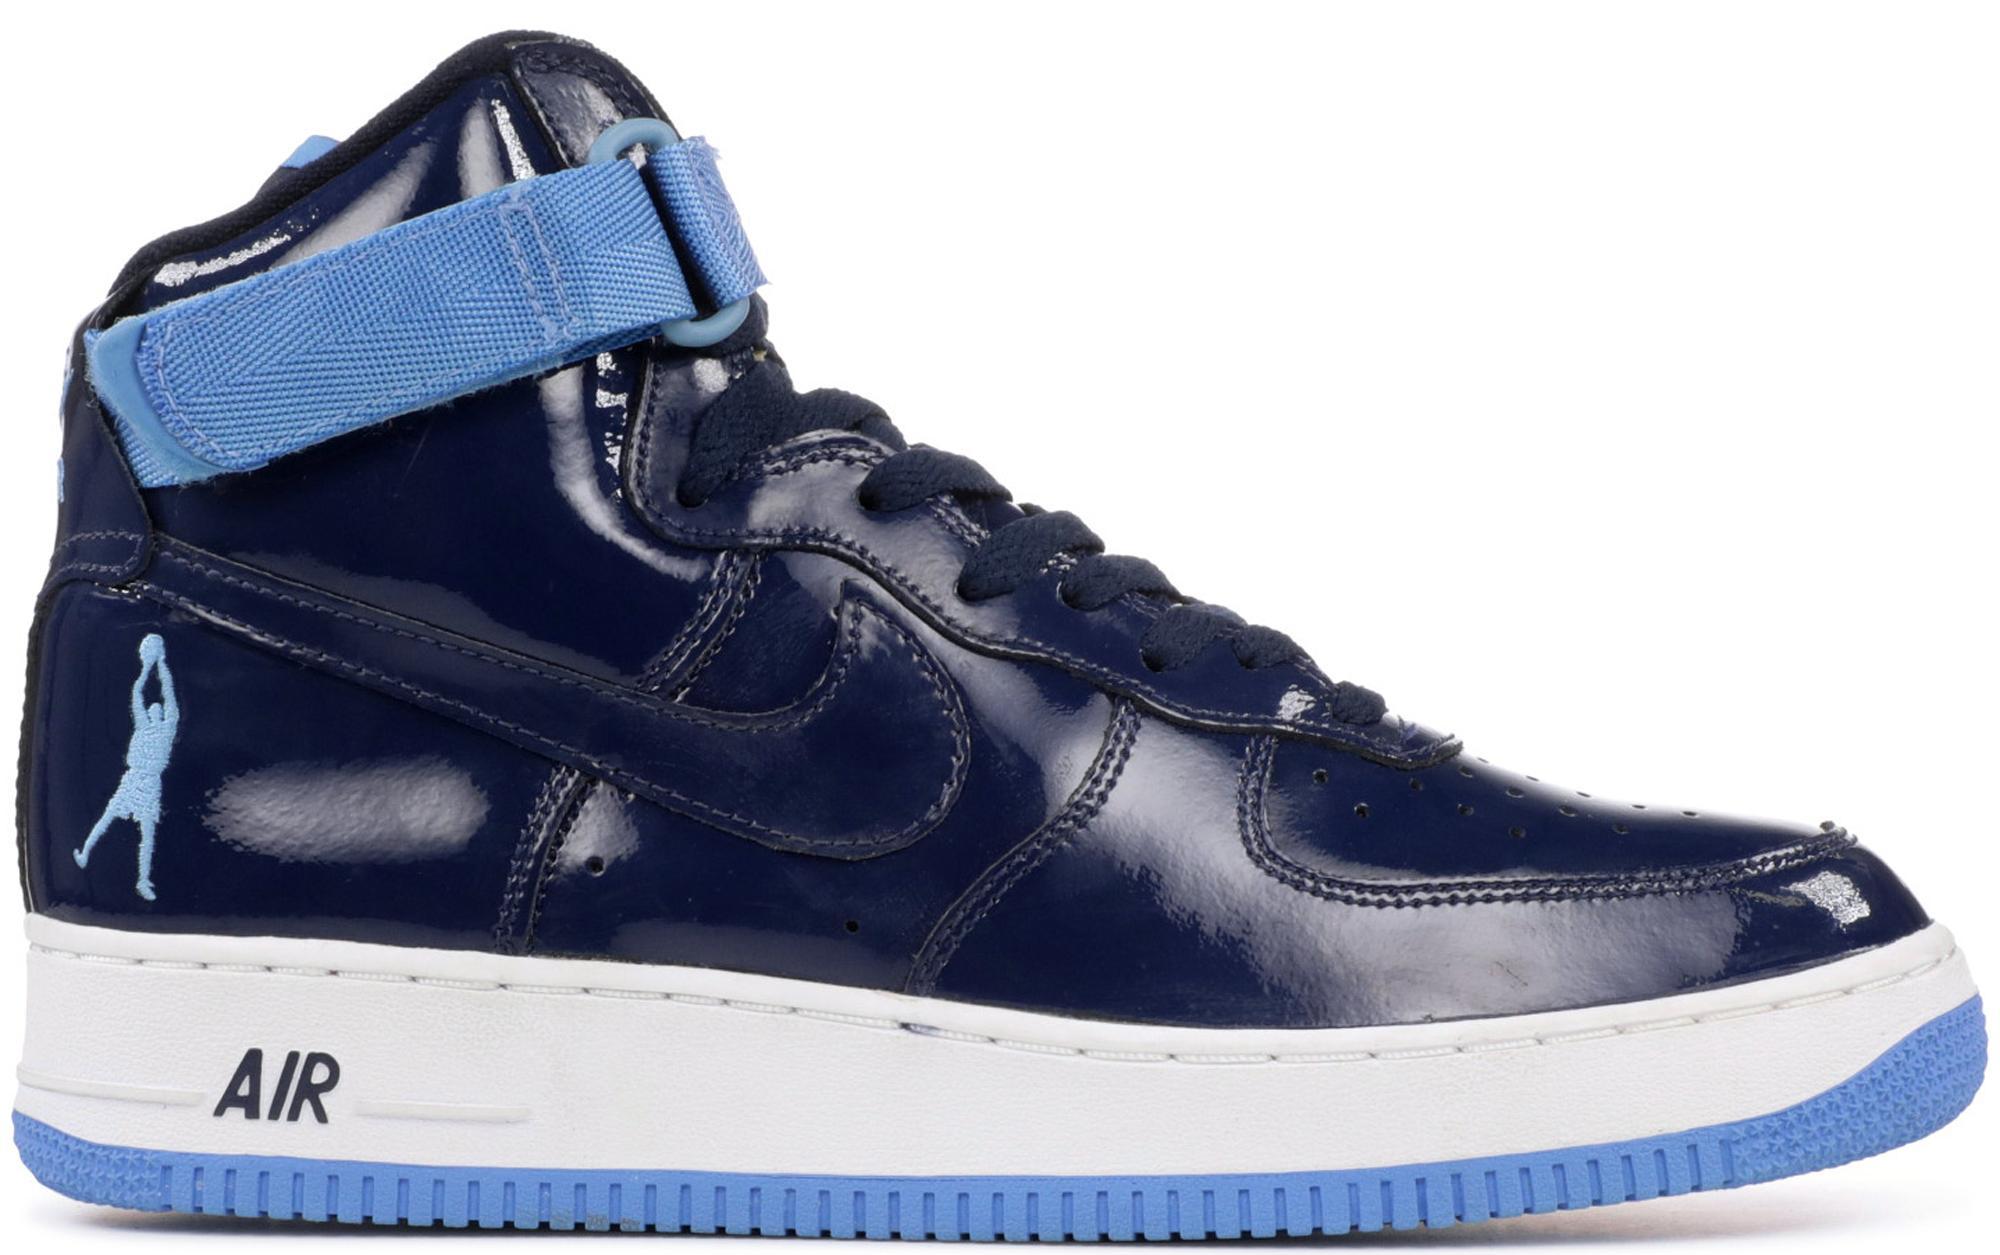 Nike Air Force 1 High Sheed Midnight